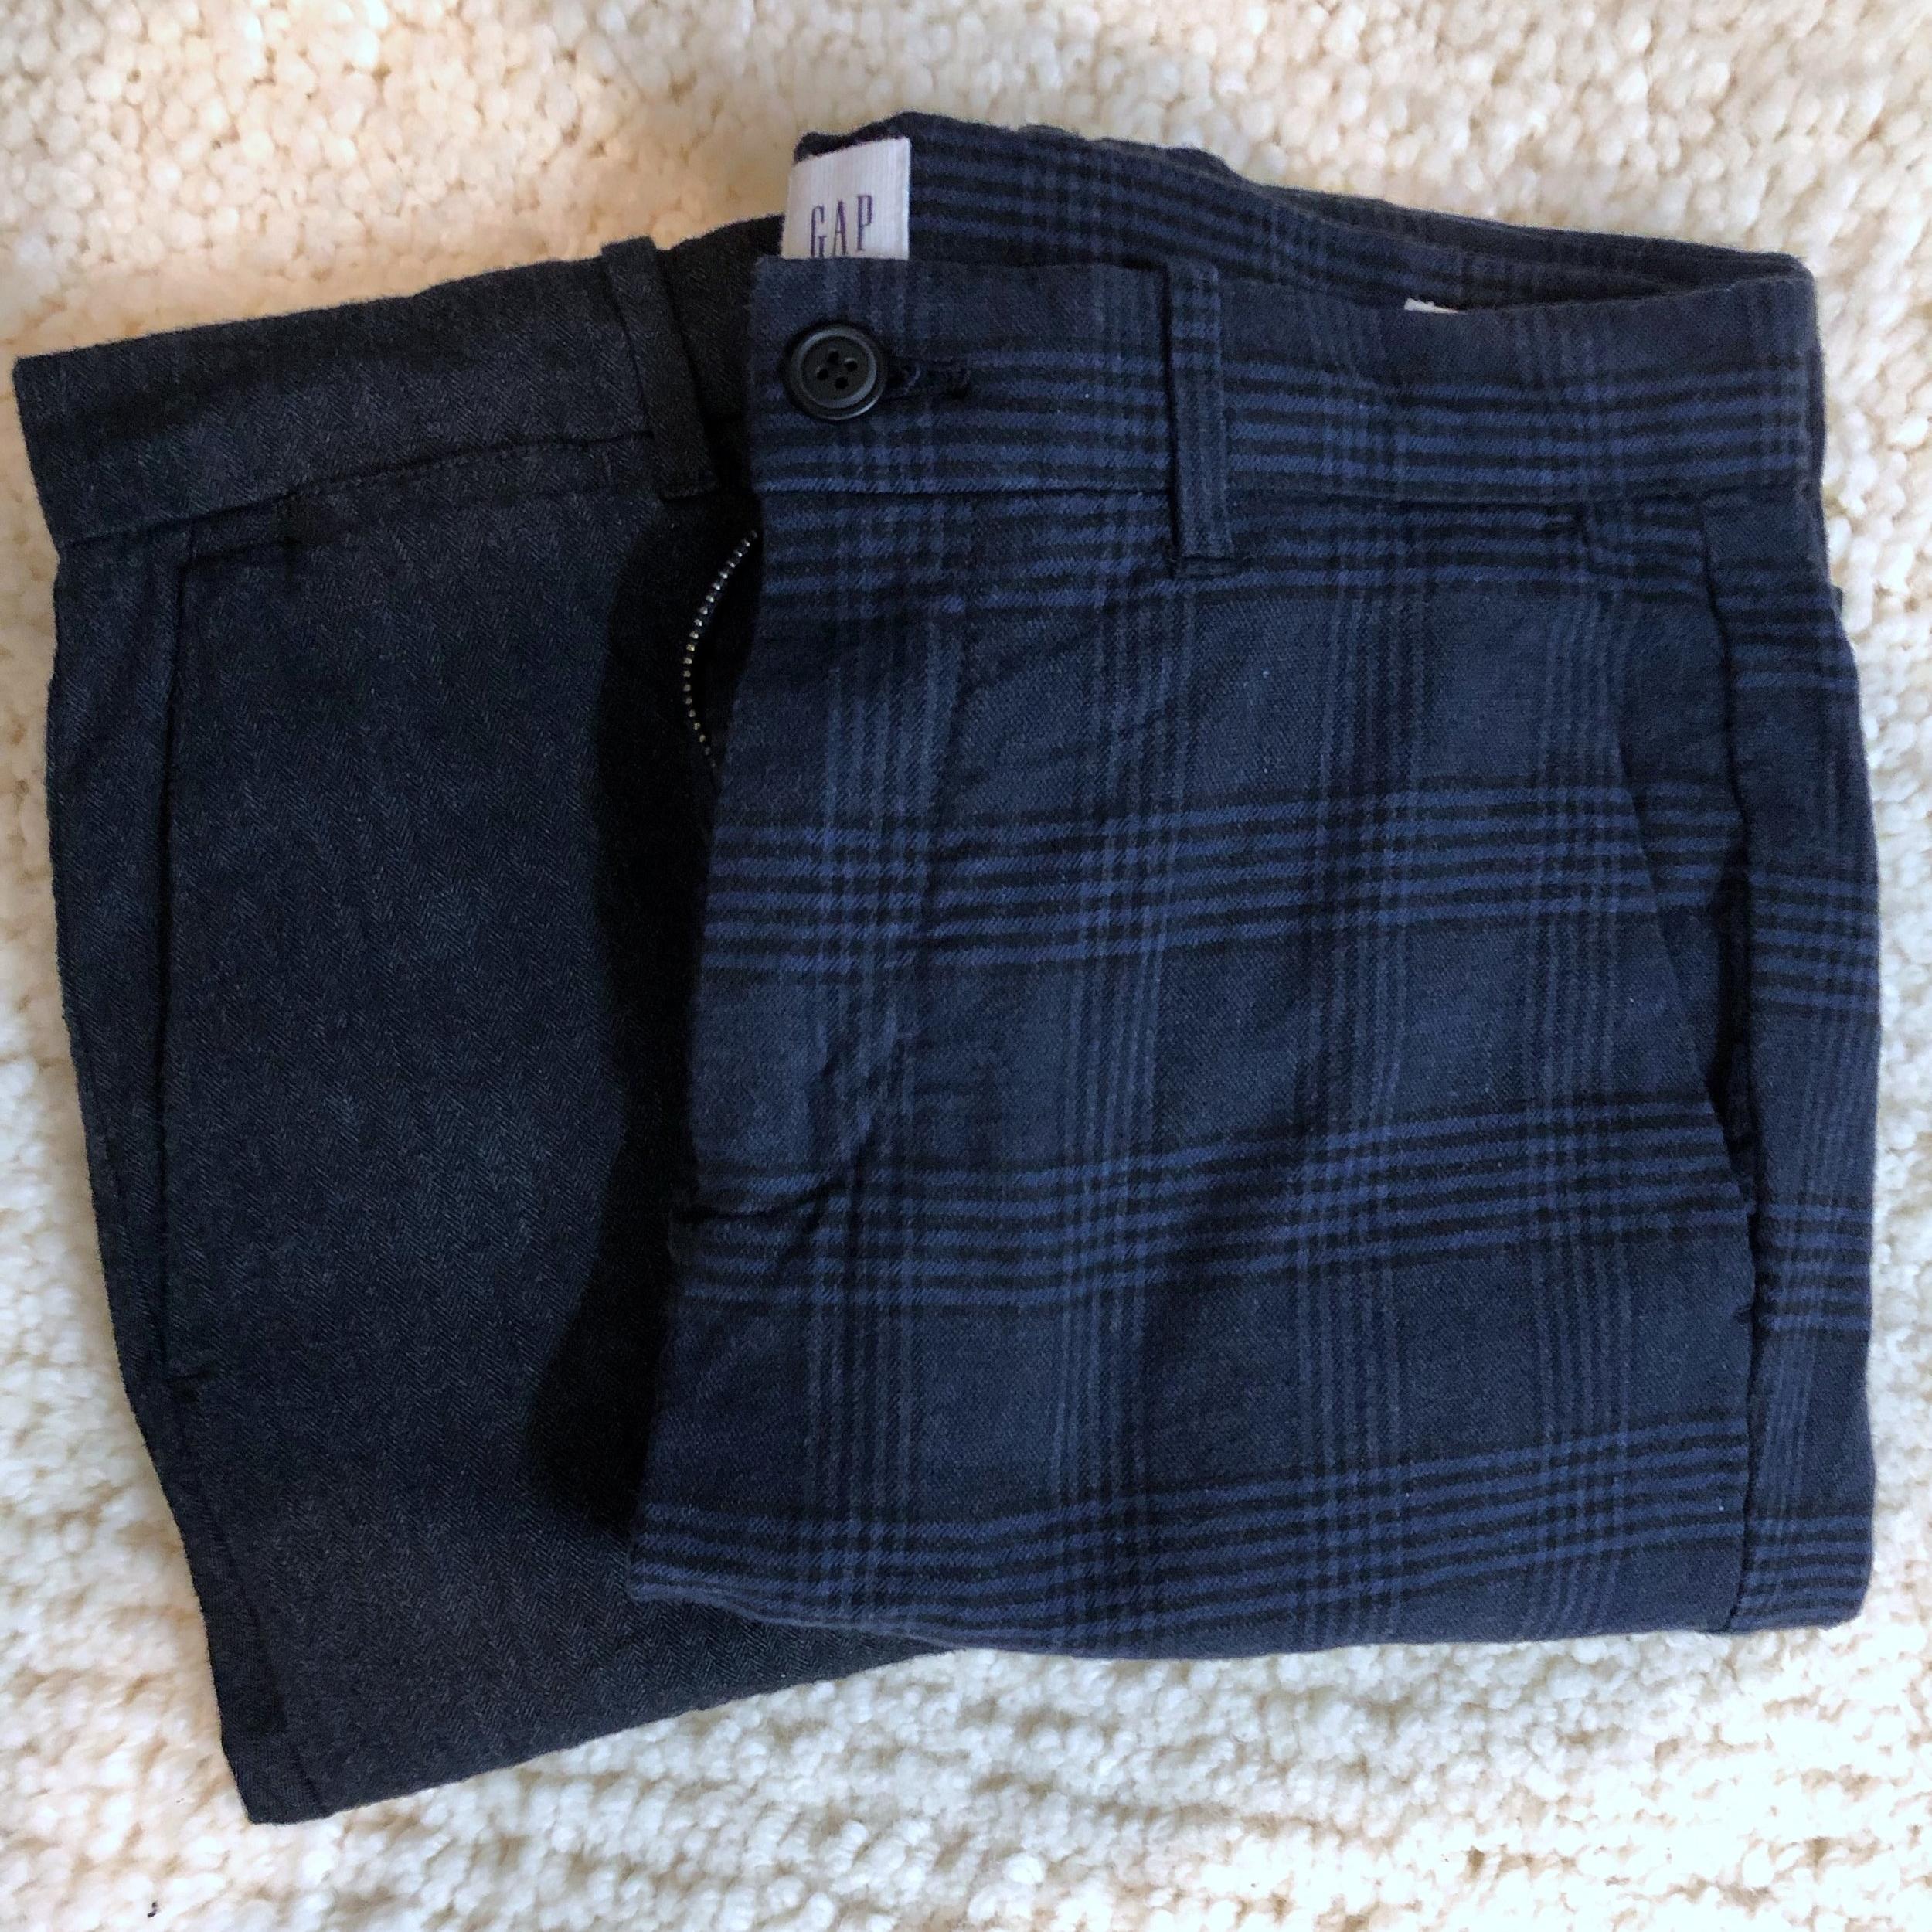 Gap Twill Pattern Skinny Fit Pants - $69.96 ($41.97 w/ code HAPPY)